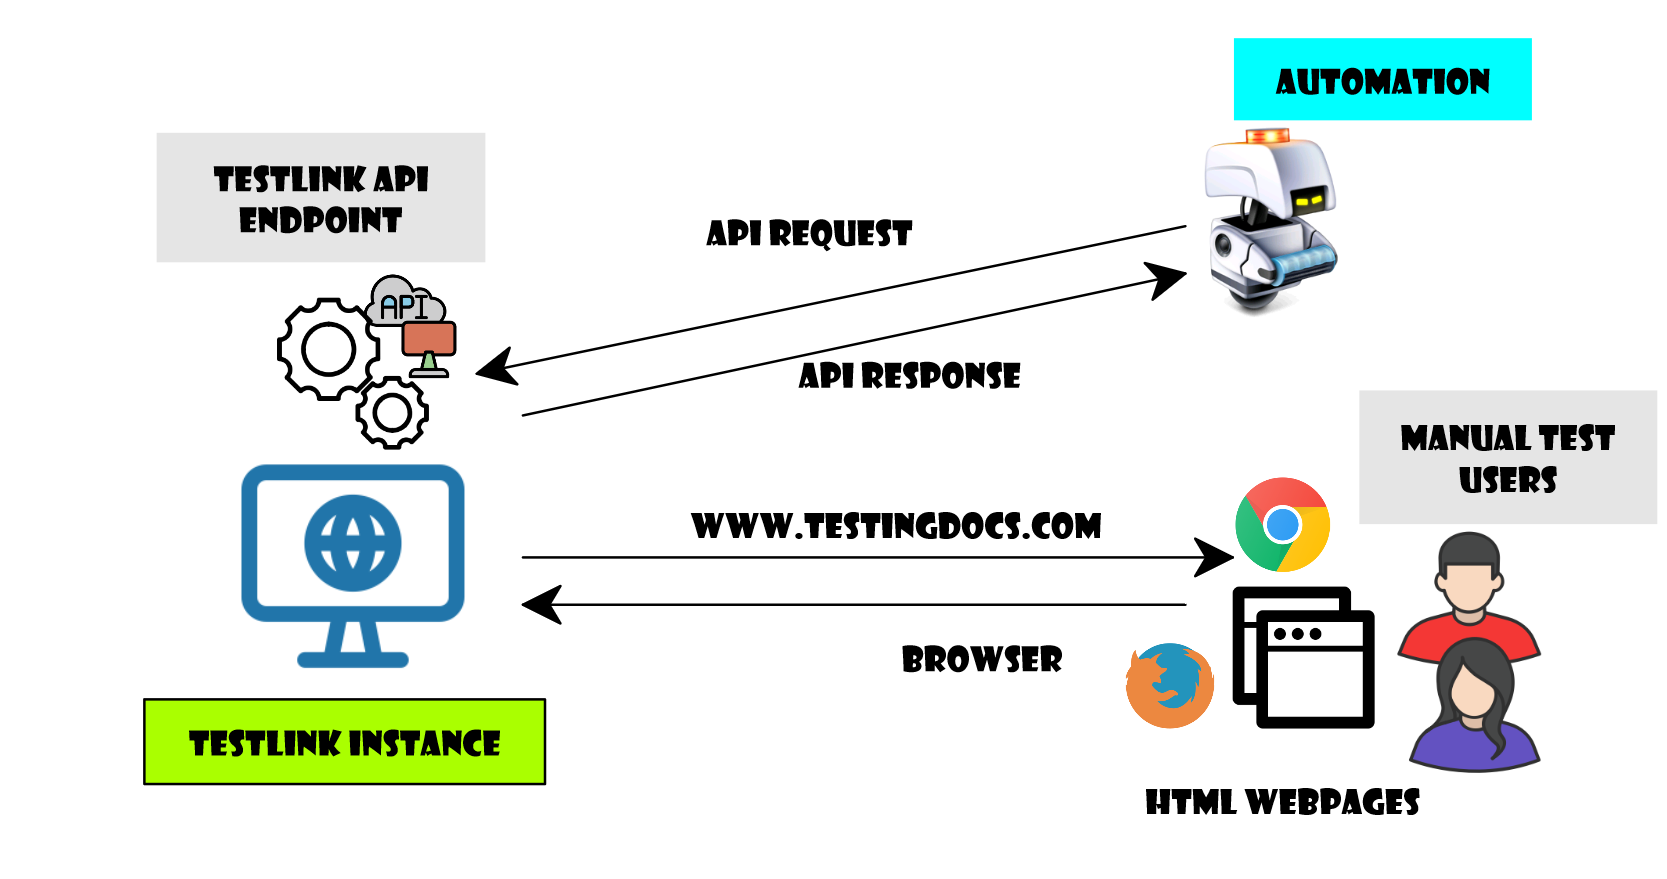 TestLink API Architecture